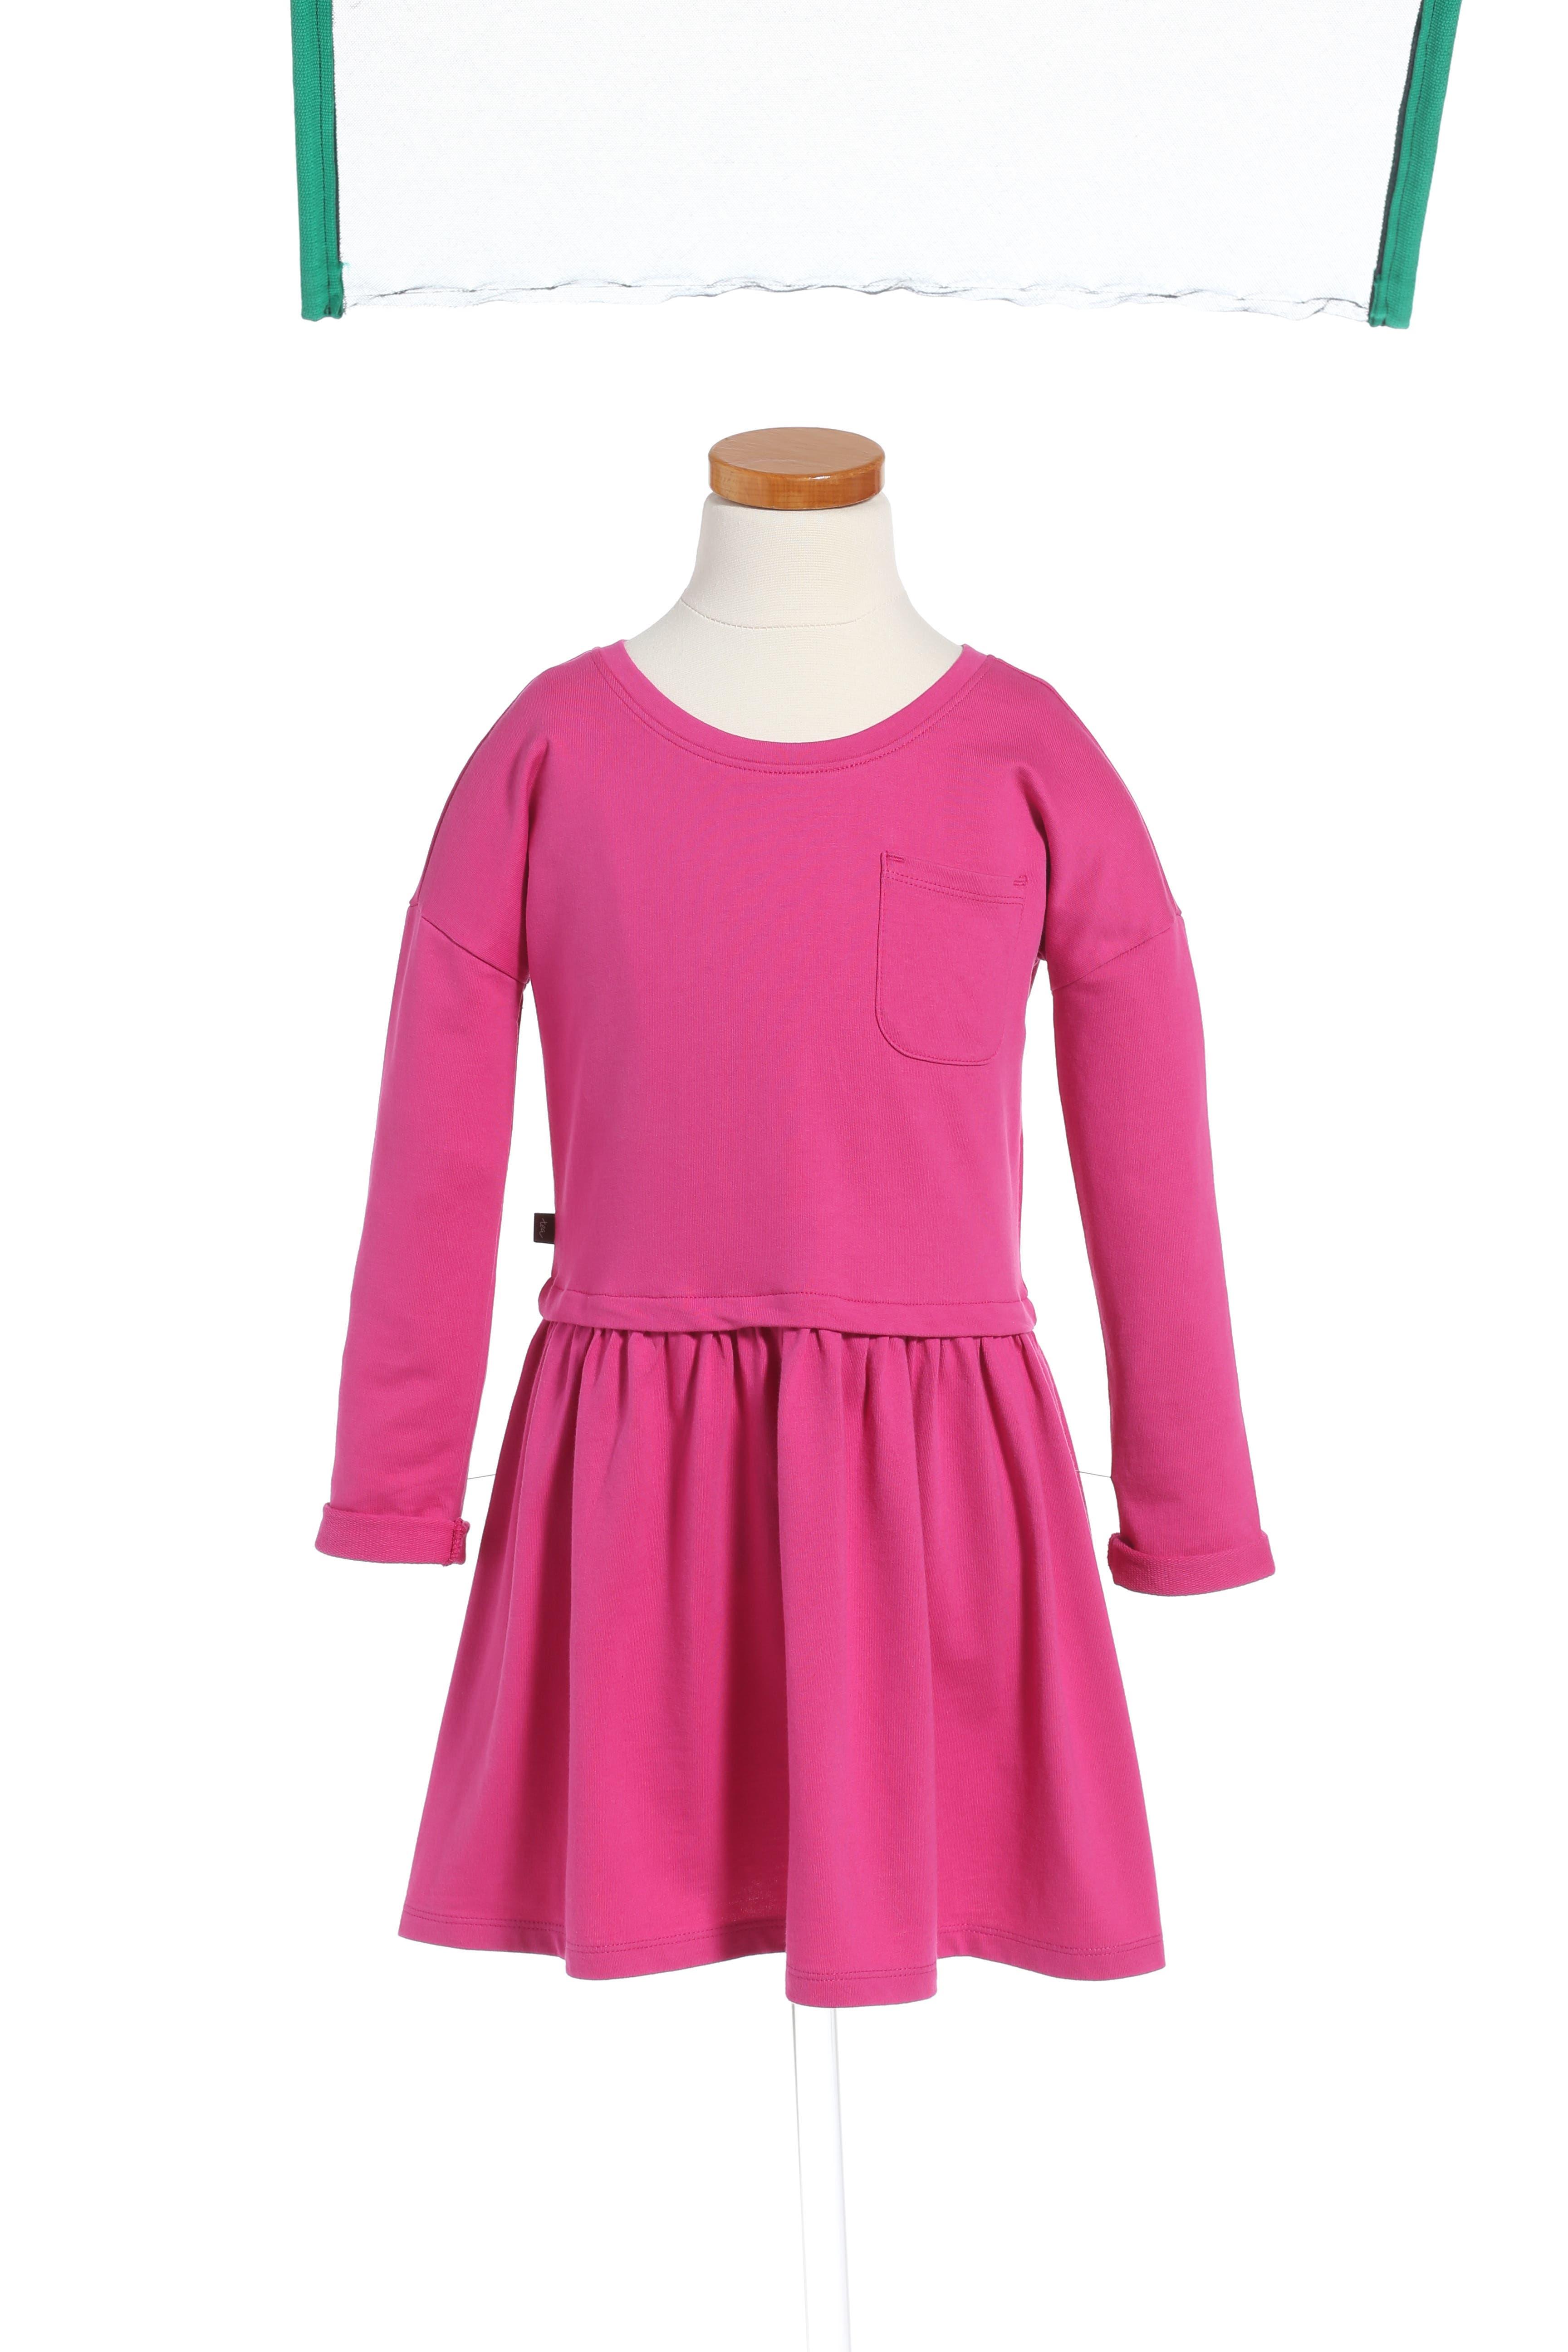 Main Image - Tea Collection Solid Pocket Dress (Toddler Girls, Little Girls & Big Girls)